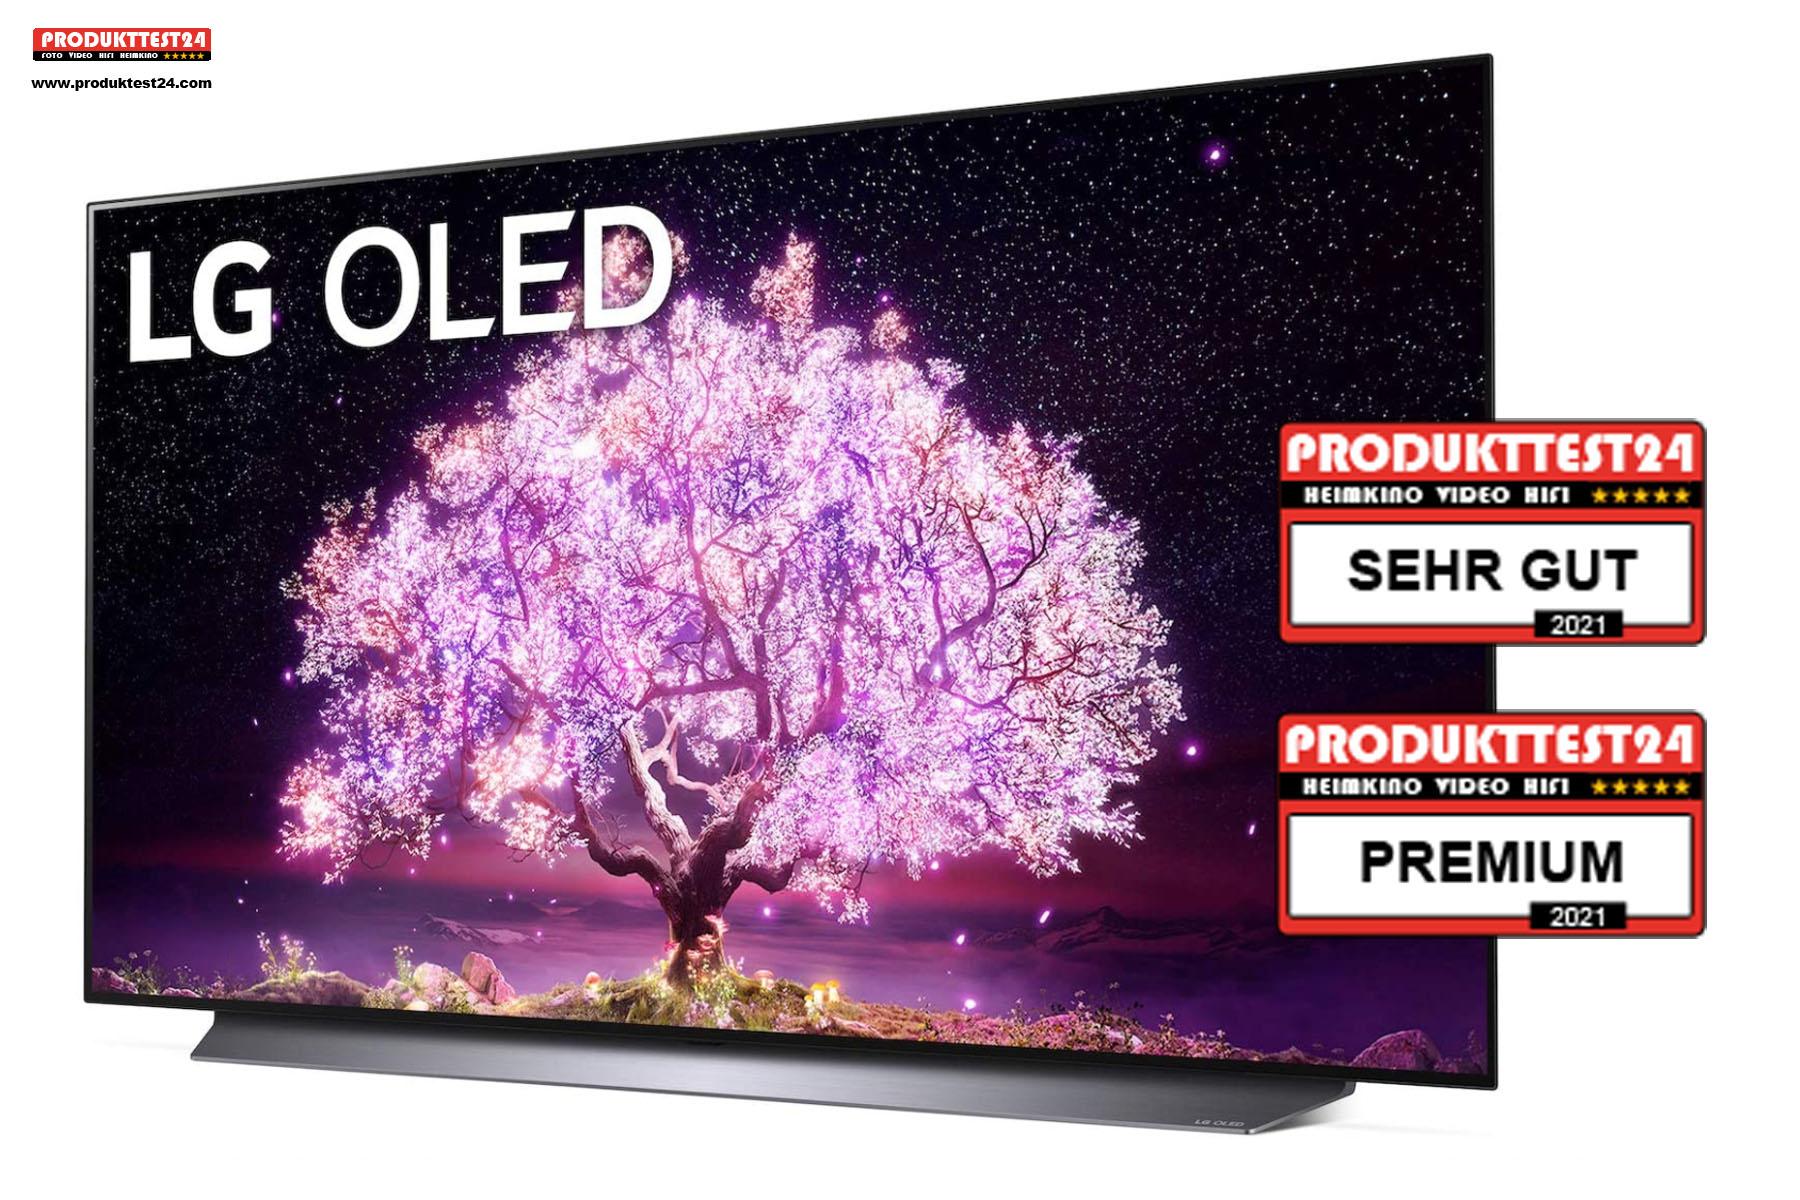 LG OLED55C17LB - Testurteil: SEHR GUT - PREMIUMKLASSE